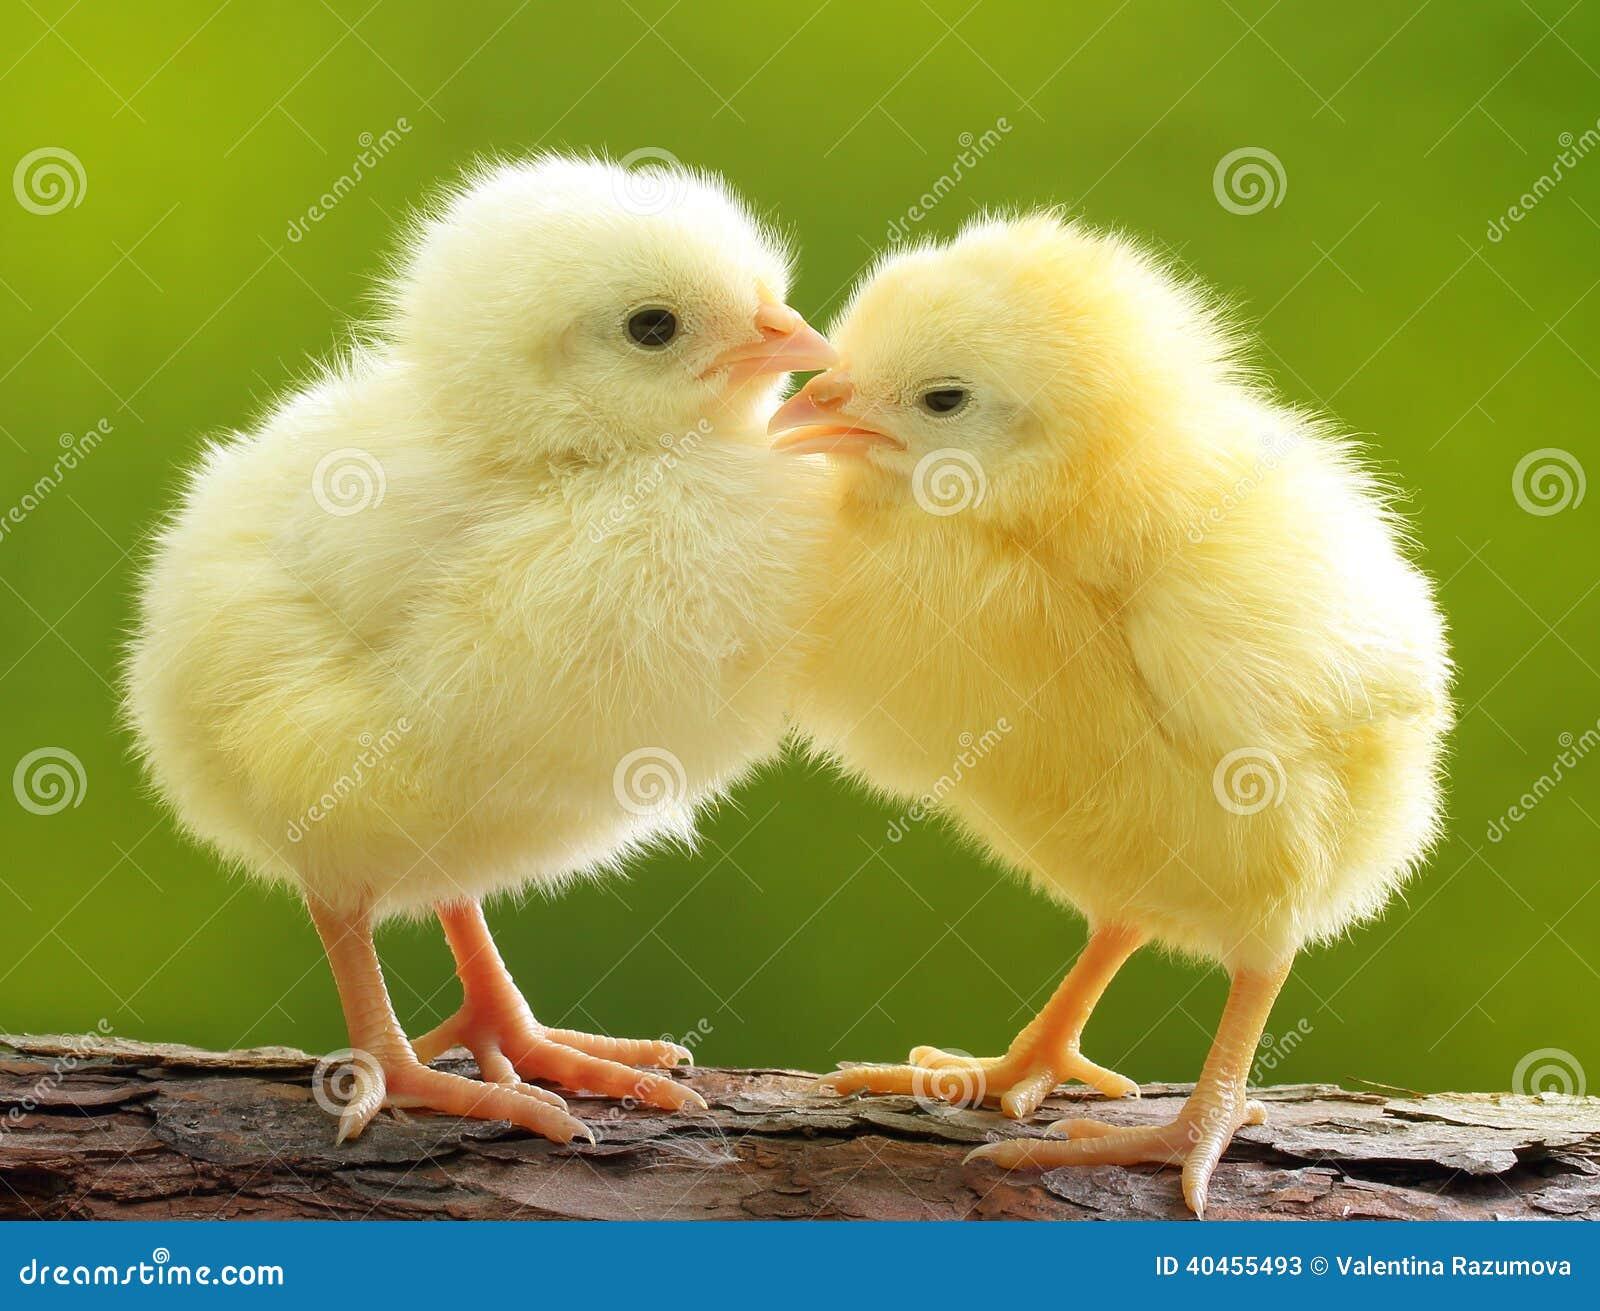 Cute little chicken over green natural background.